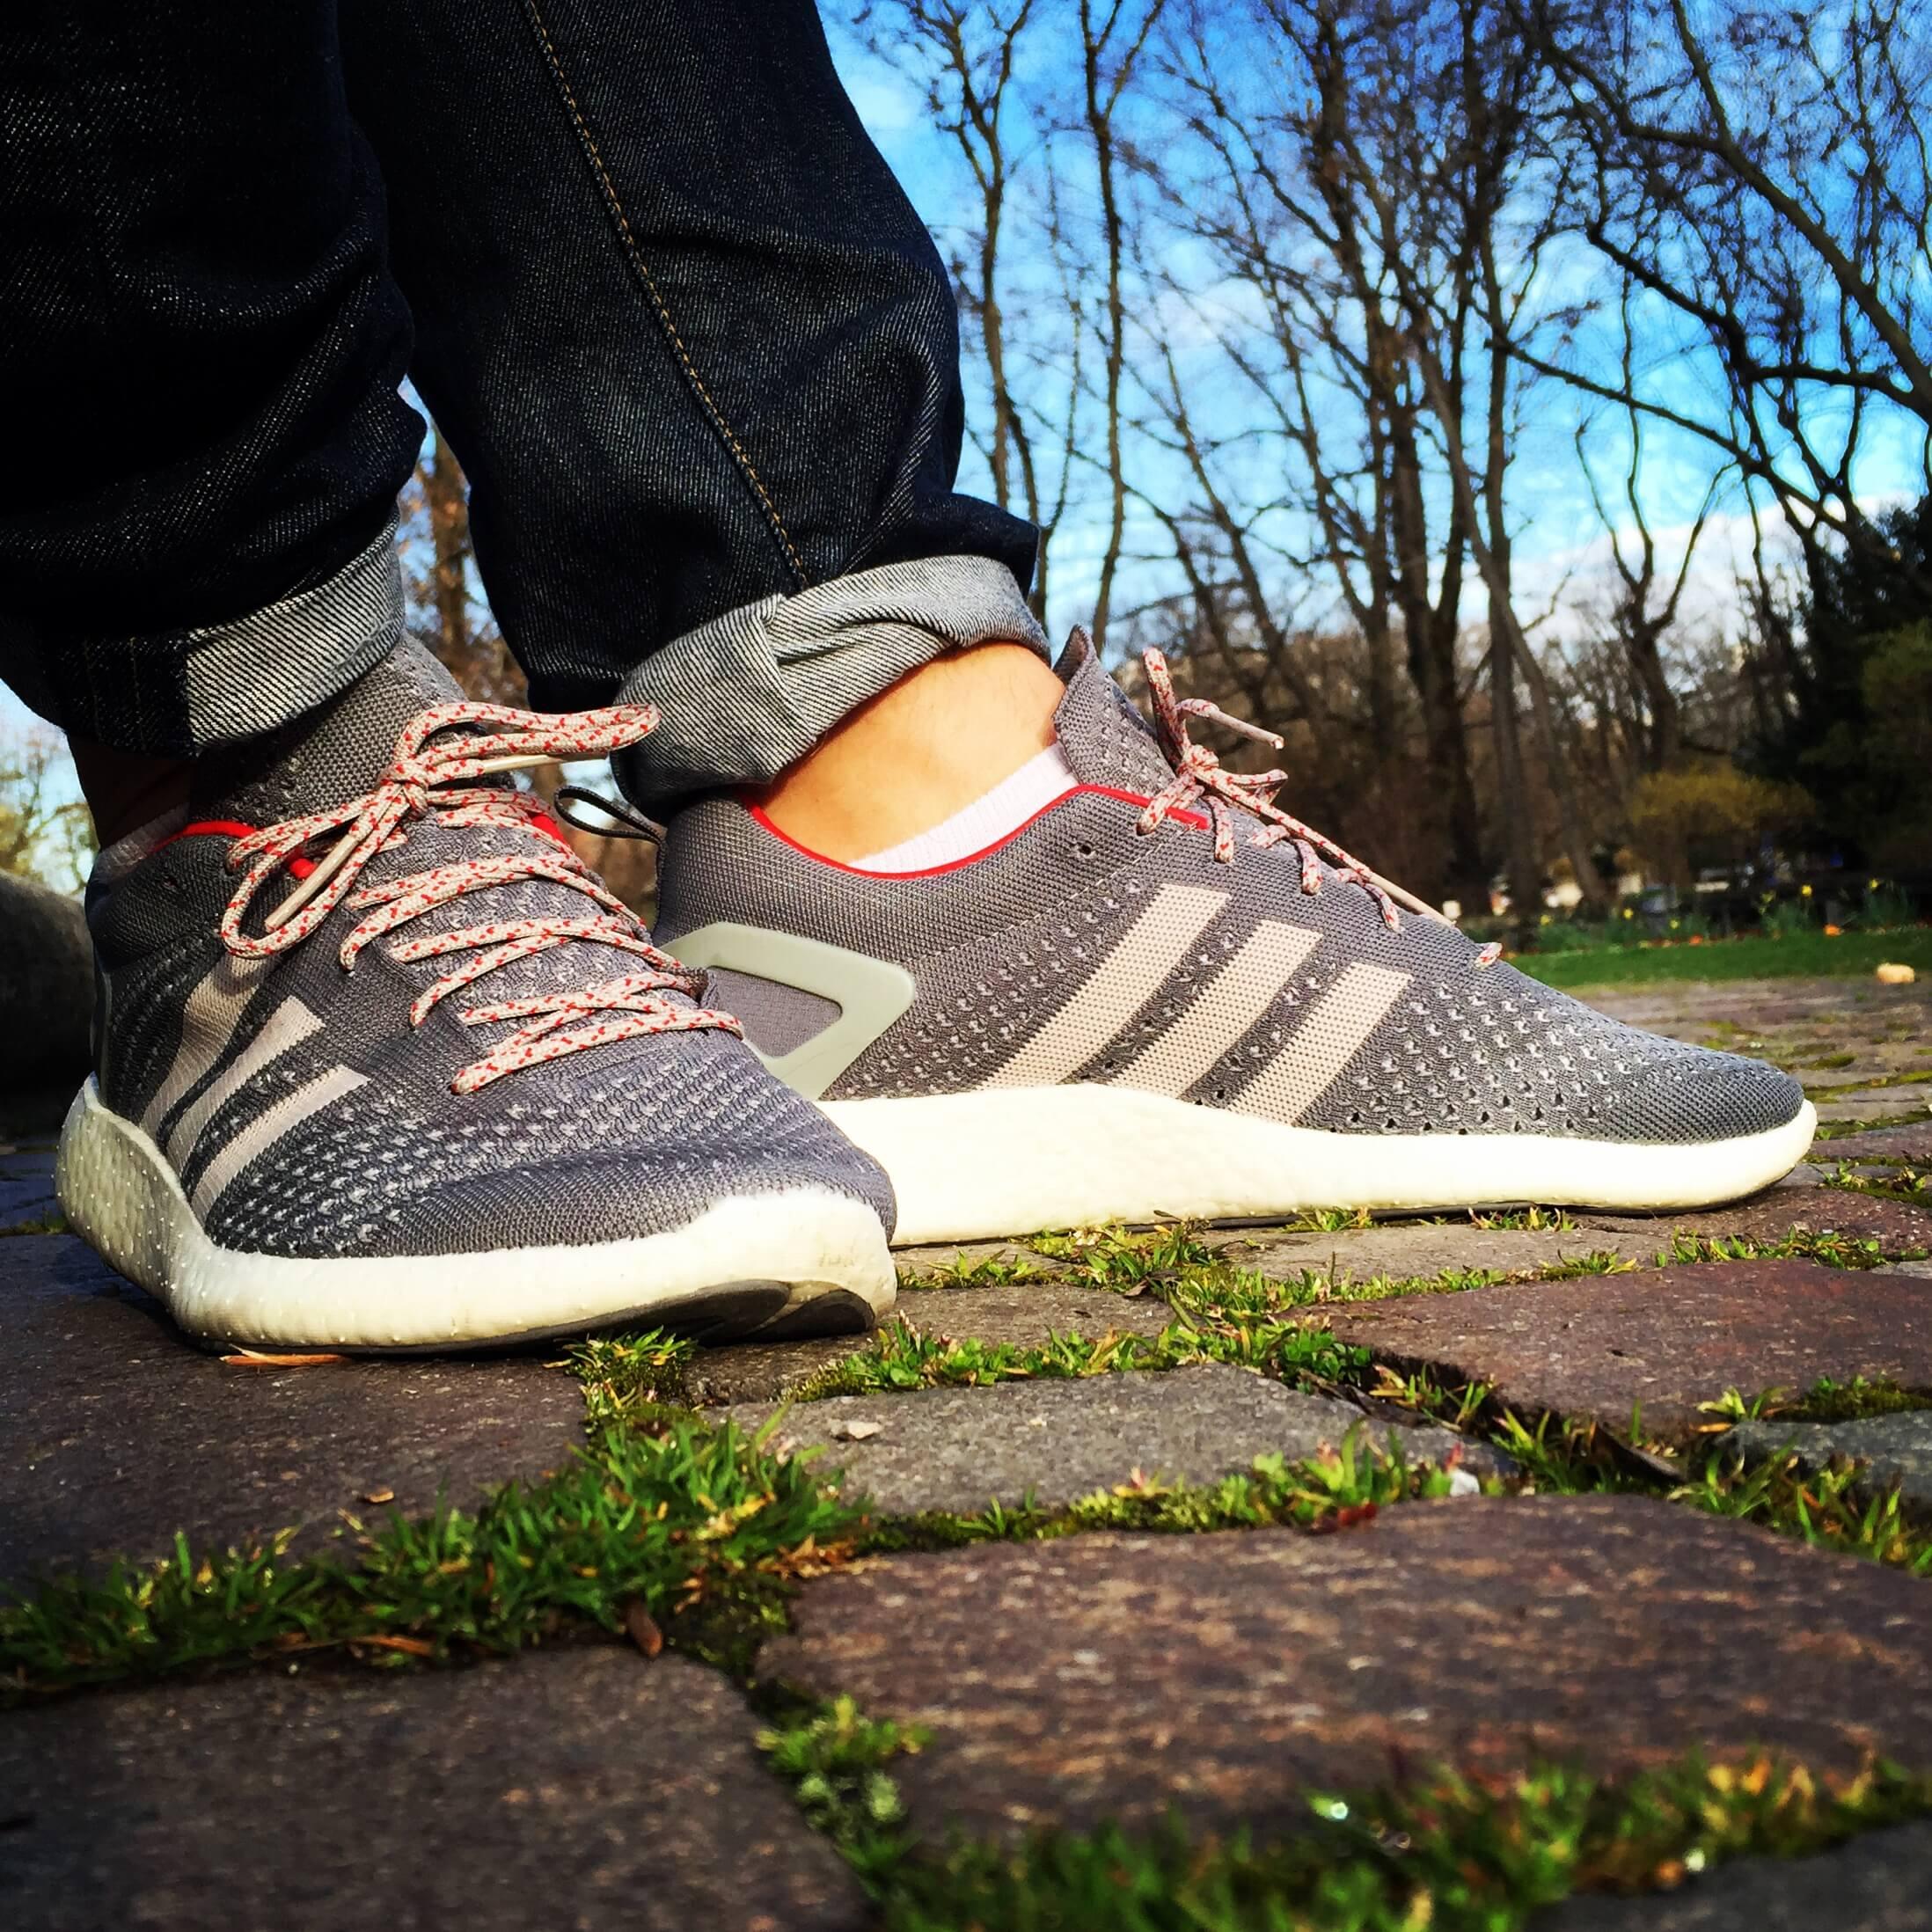 Adidas-Pure-Boost-Primeknit-Side-View-Alt-Benstah-Onfeet